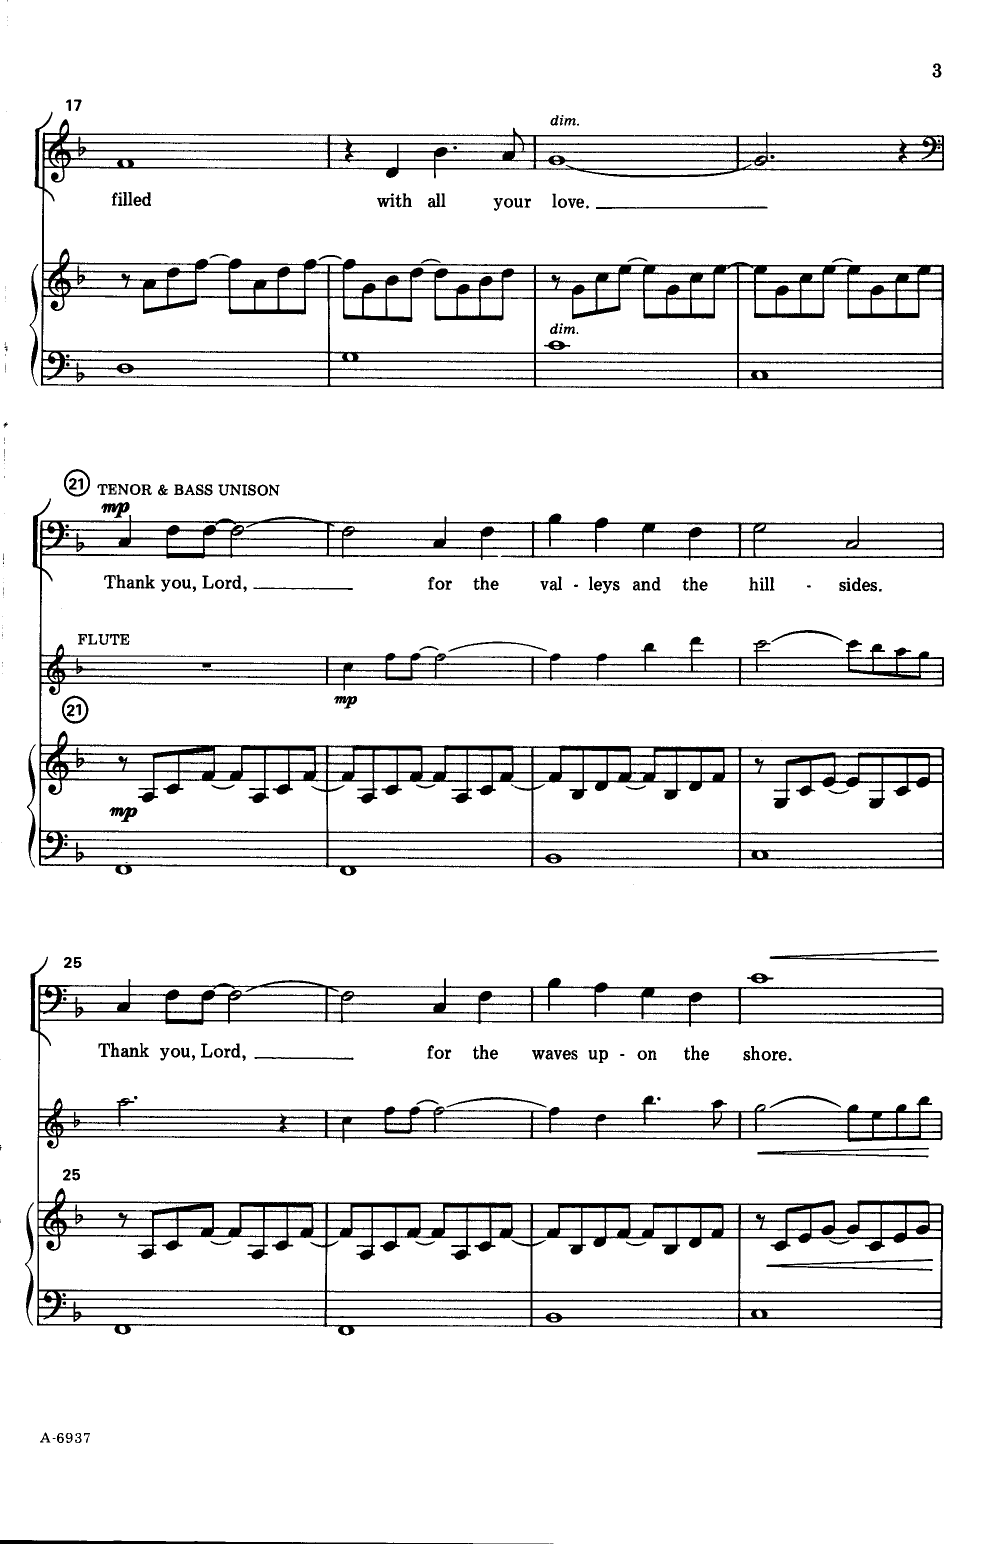 thank you lord sheet music pdf